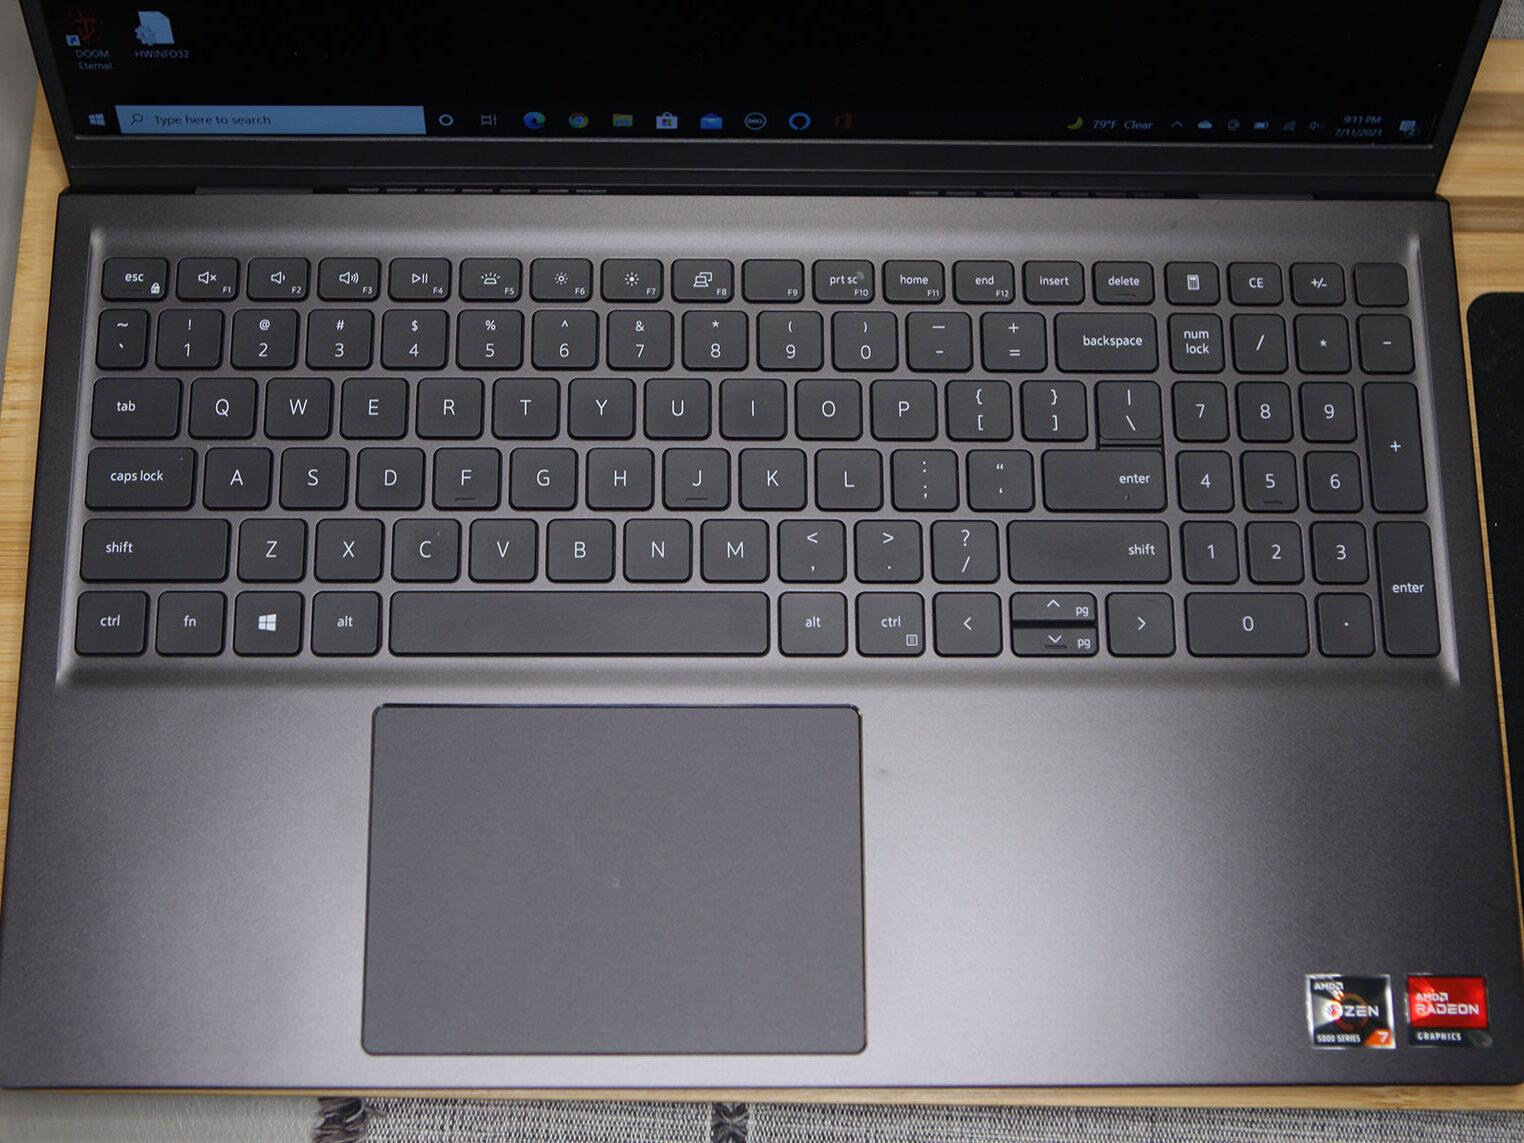 Dell Inspiron 15 AMD keyboard